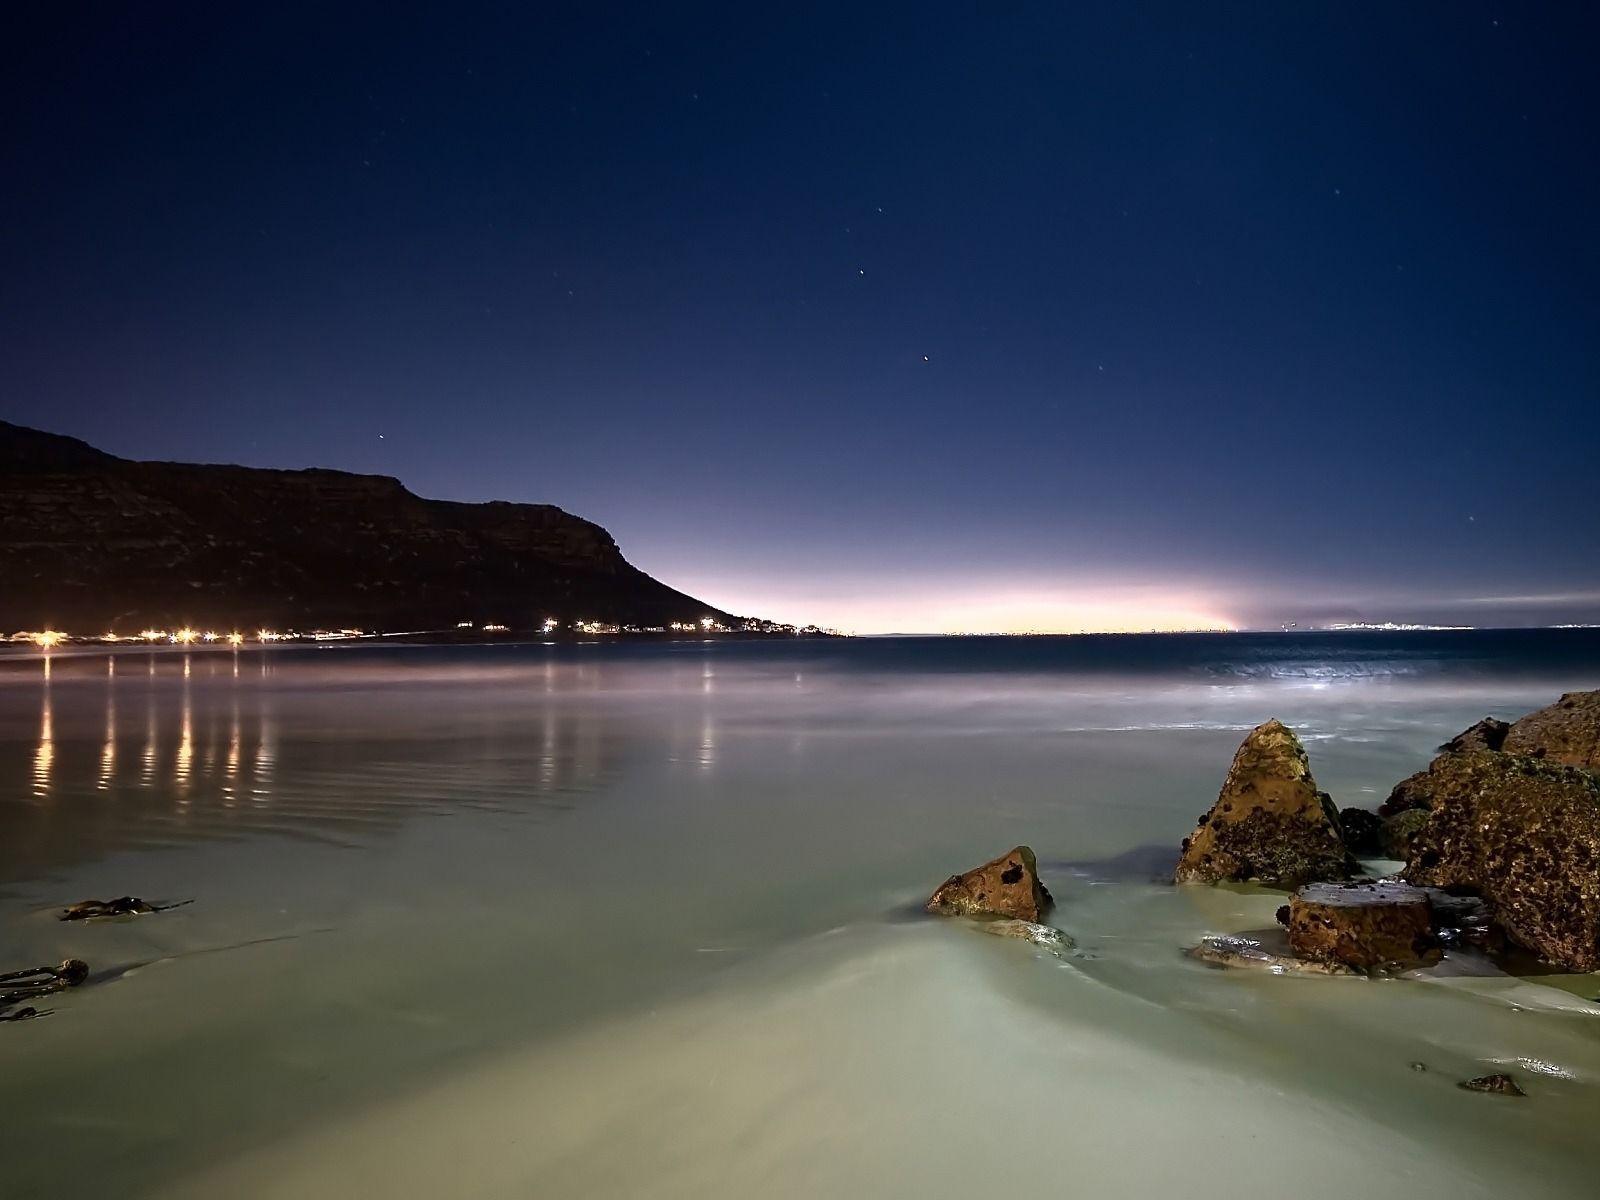 lovely evening | tropical vacation spots | pinterest | beach